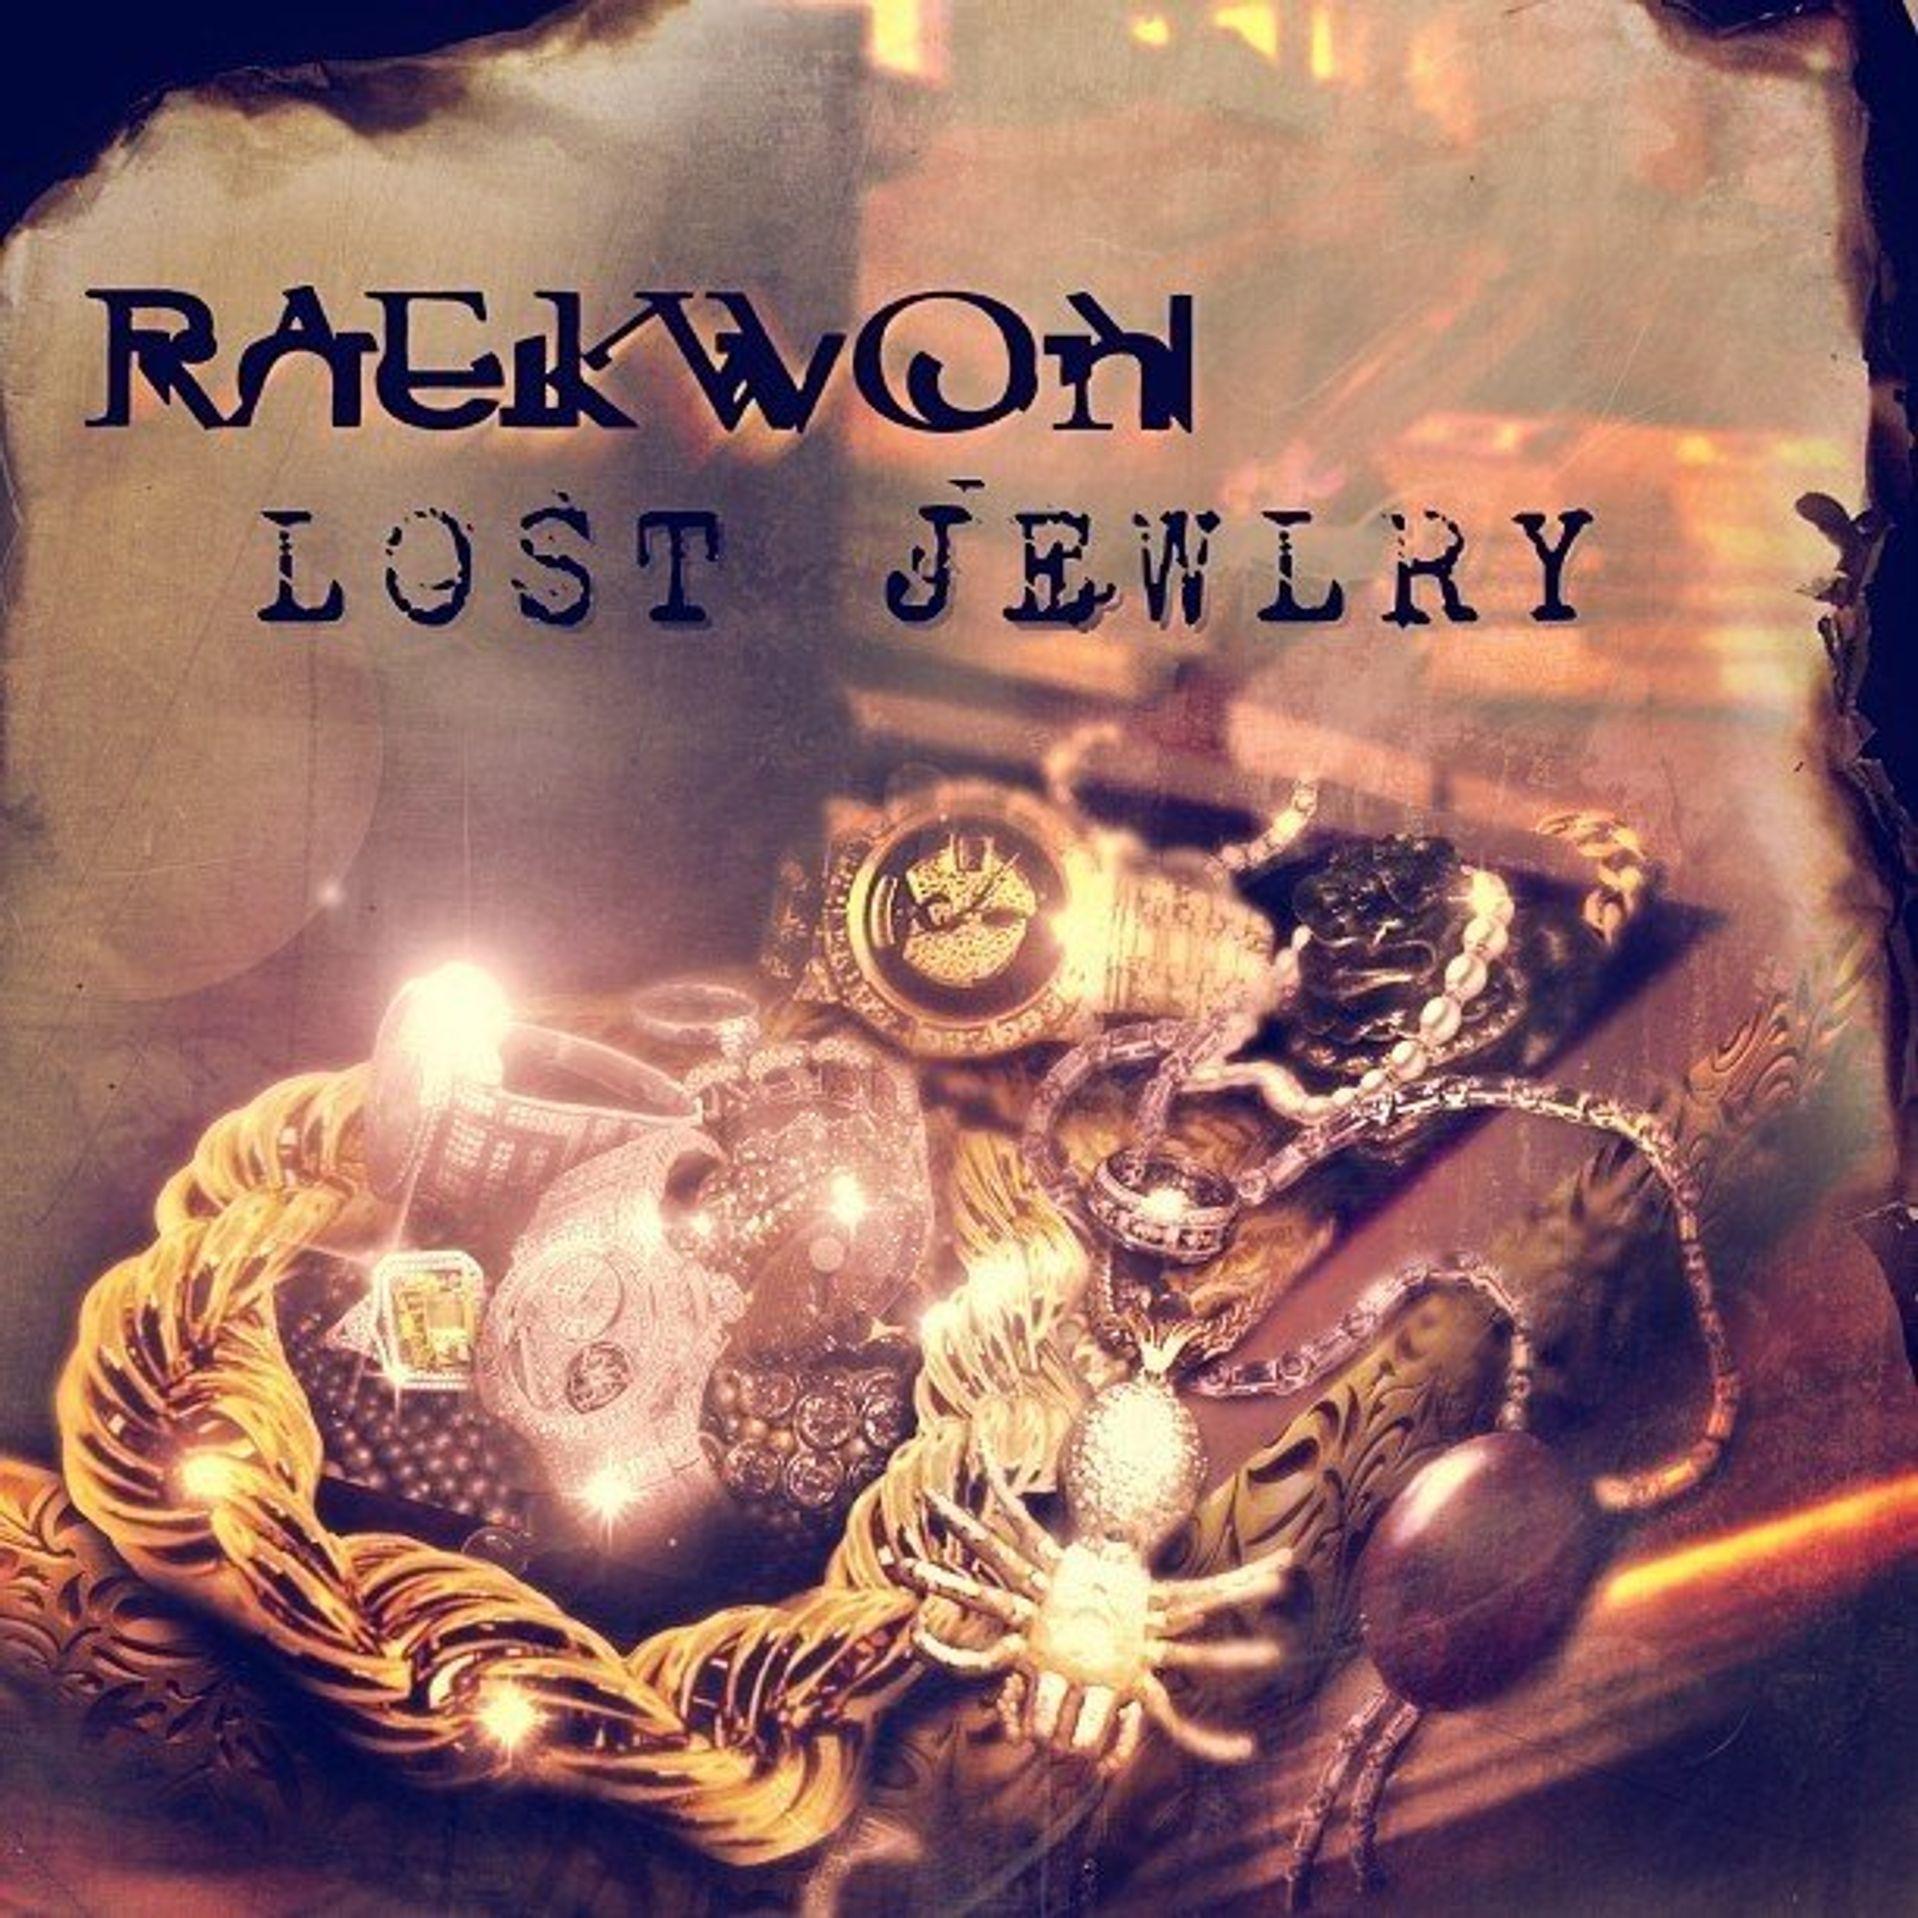 Album Title: Lost Jewlry by: Raekwon